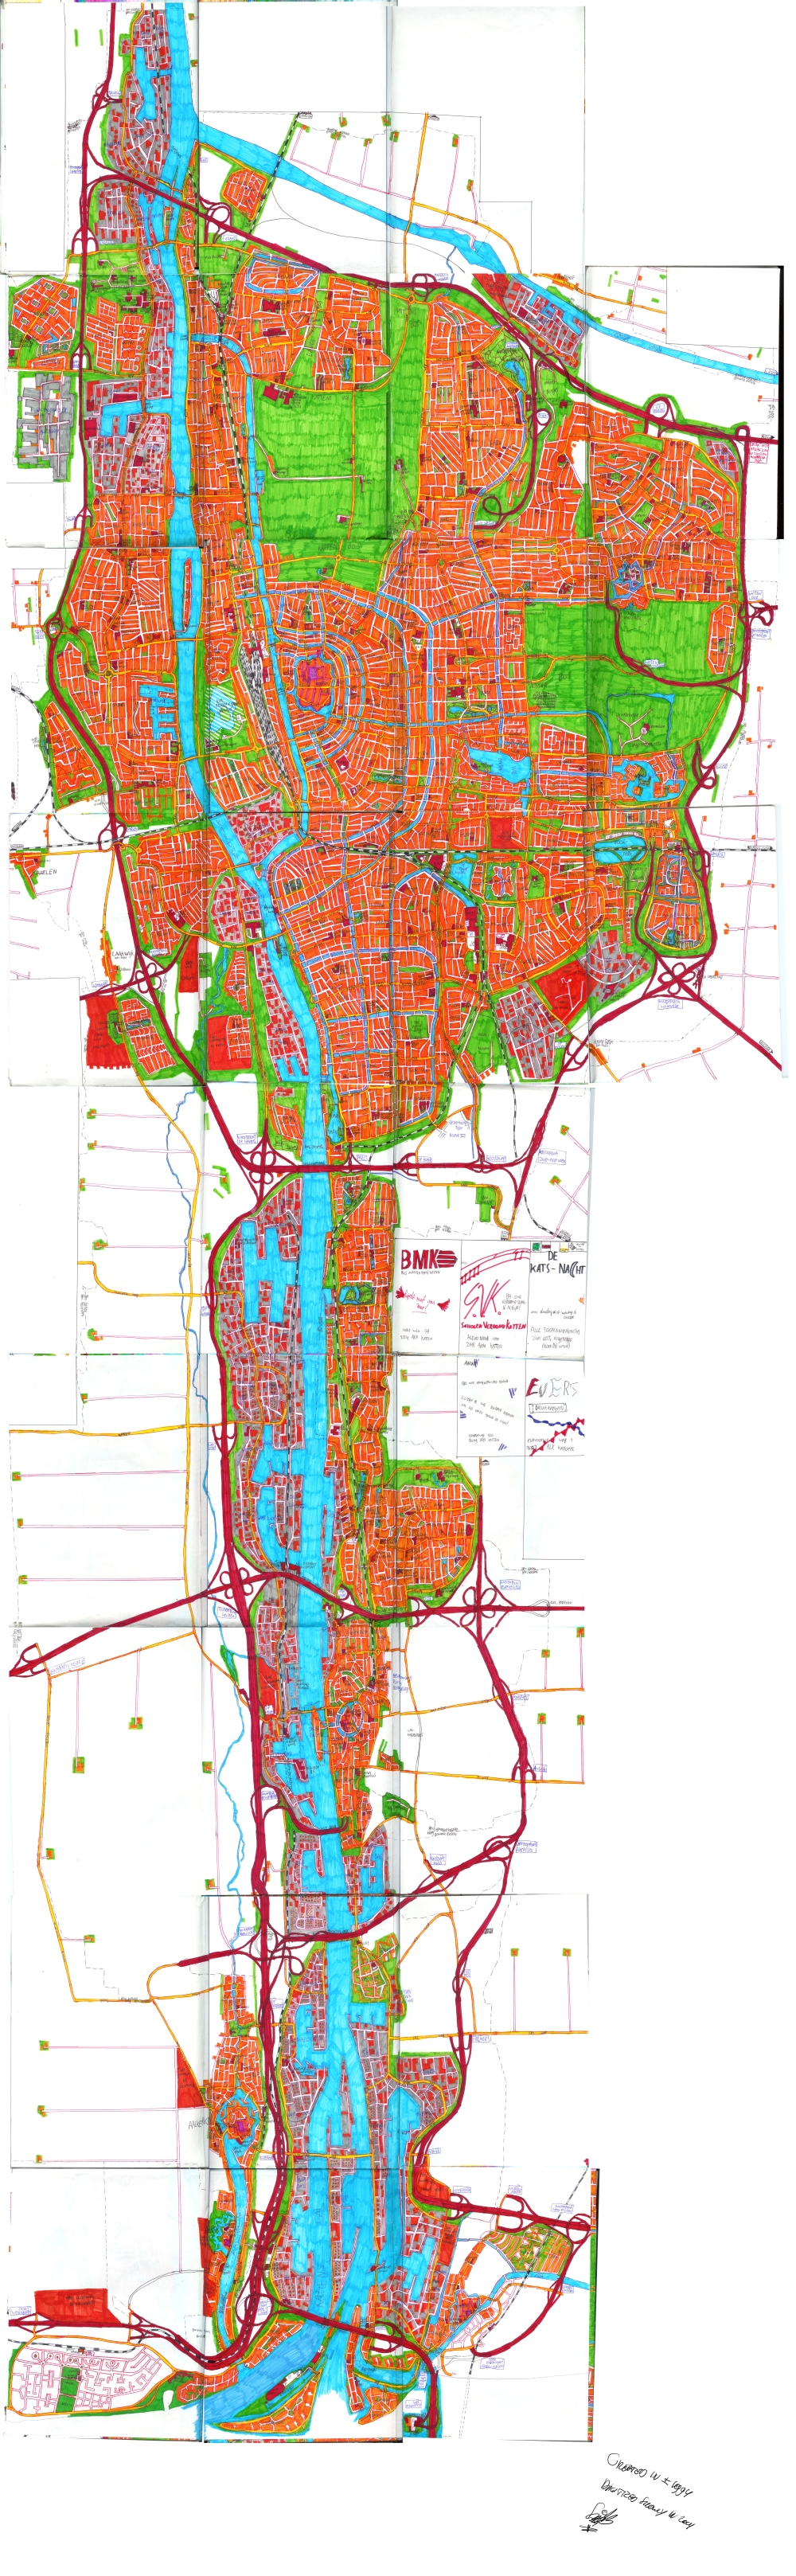 Hand-drawn city map